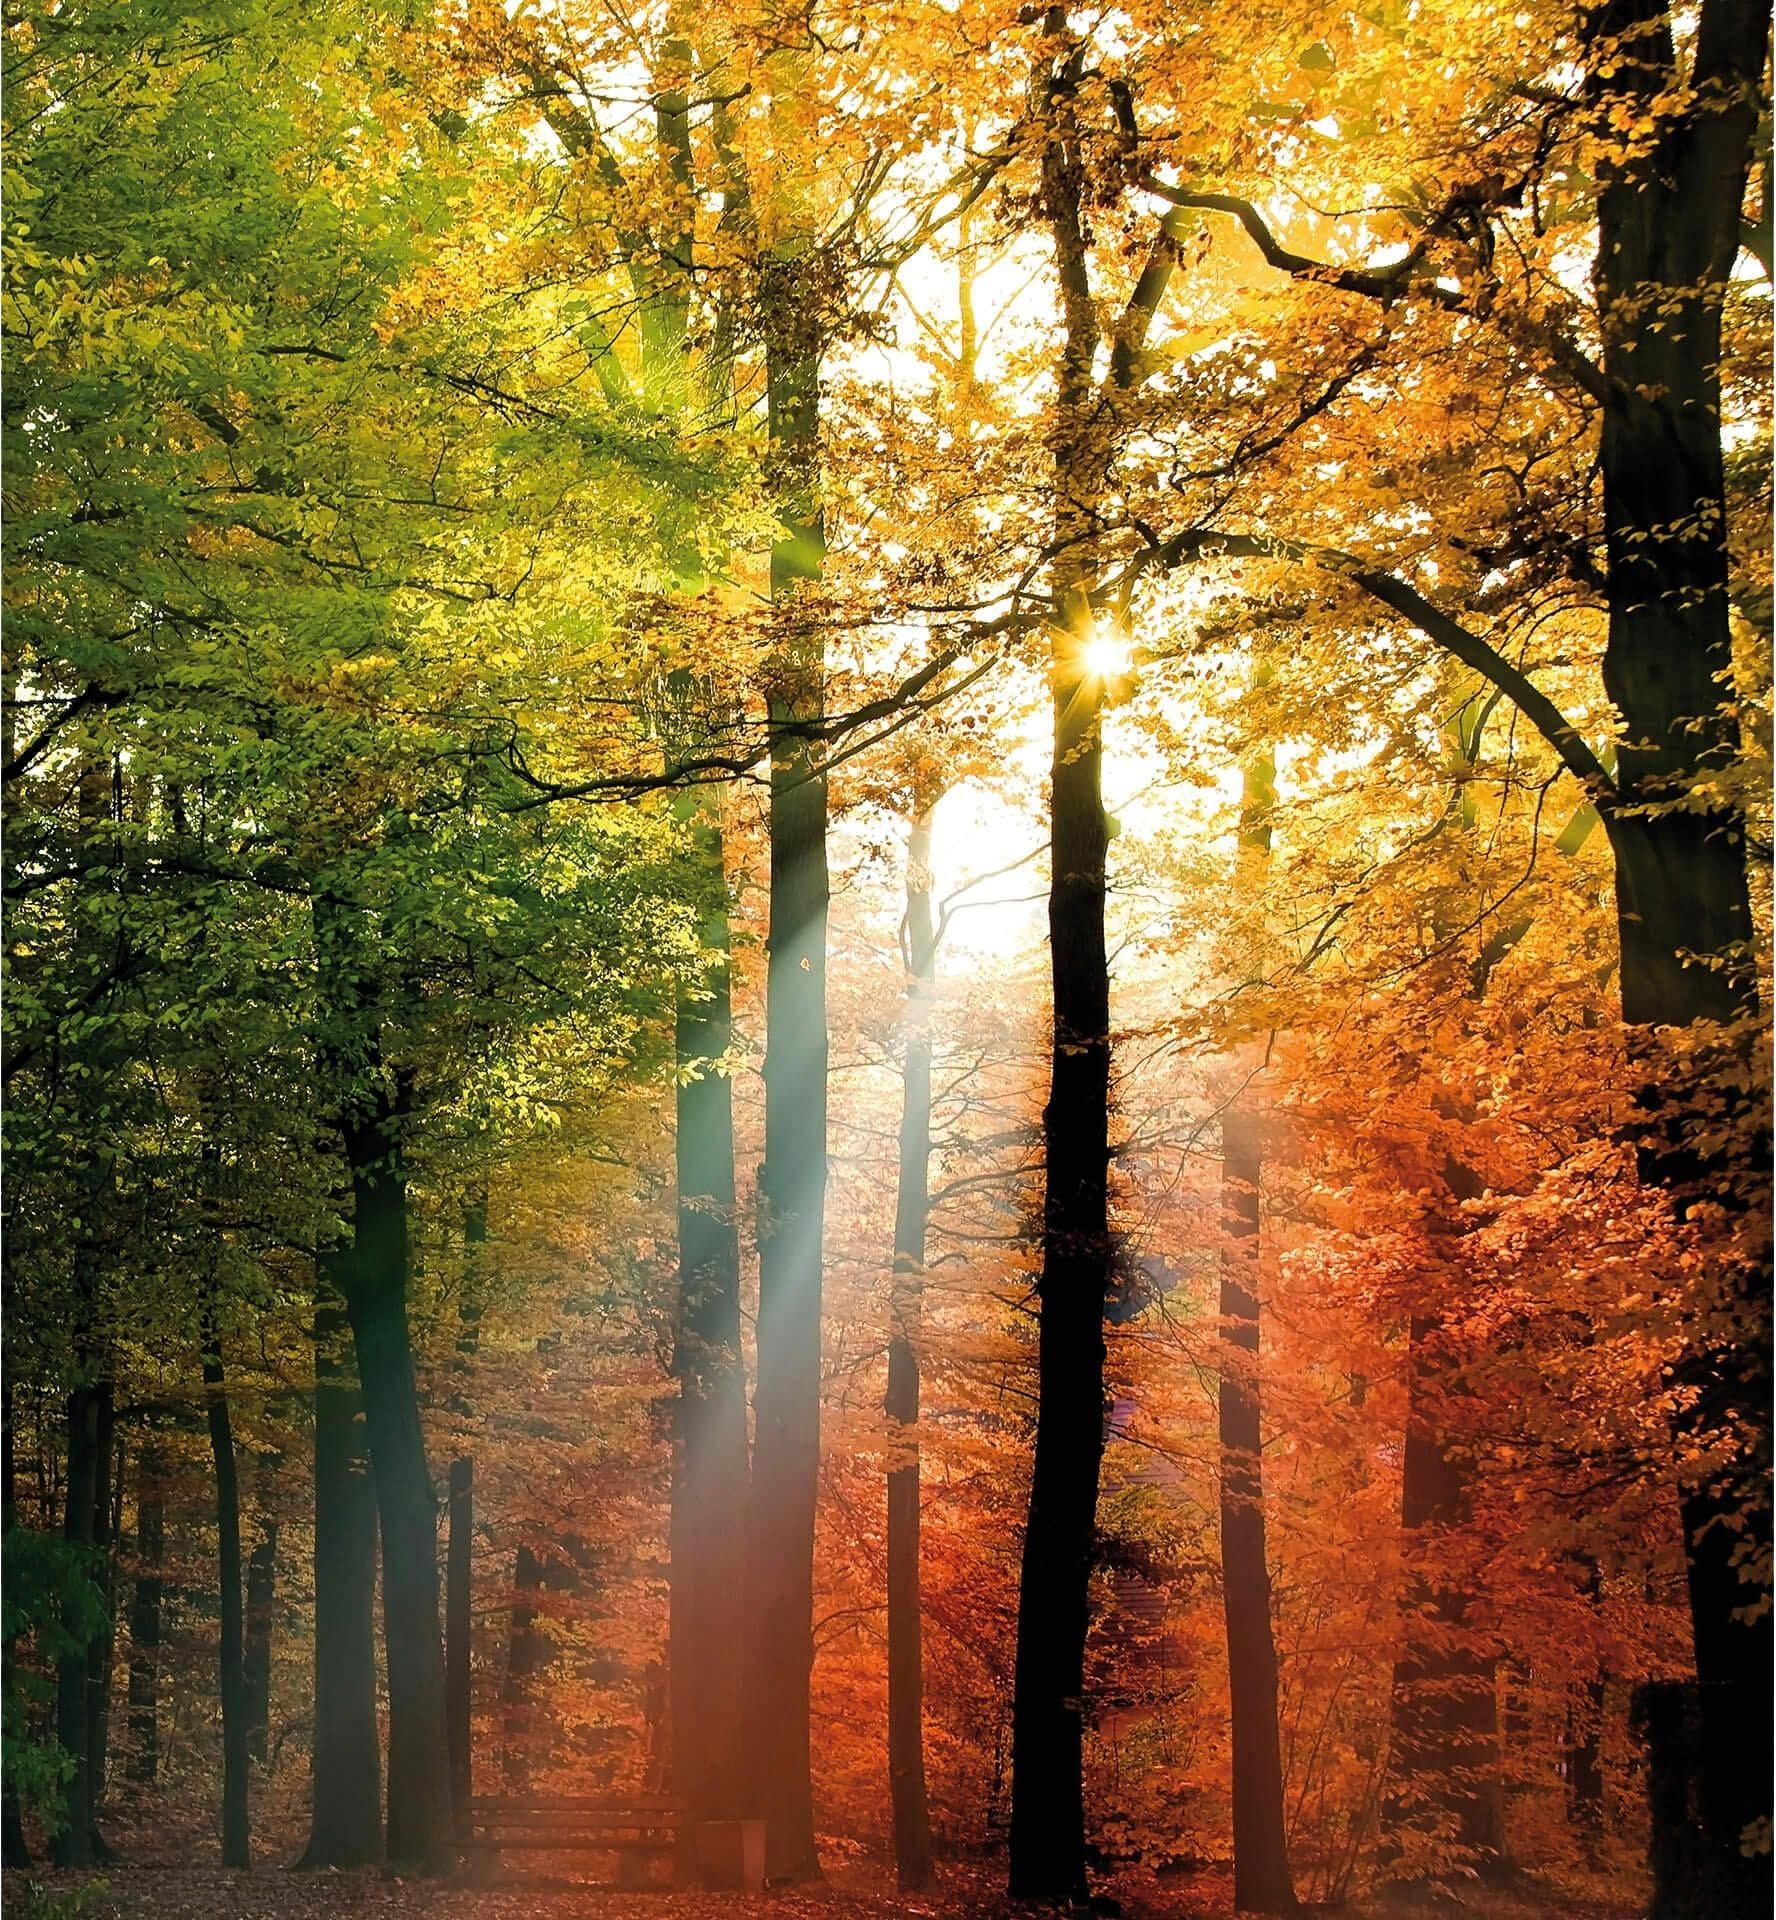 Fototapete Goldener Herbst 240/260 cm Wohnen/Wohntextilien/Tapeten/Fototapeten/Fototapeten Natur